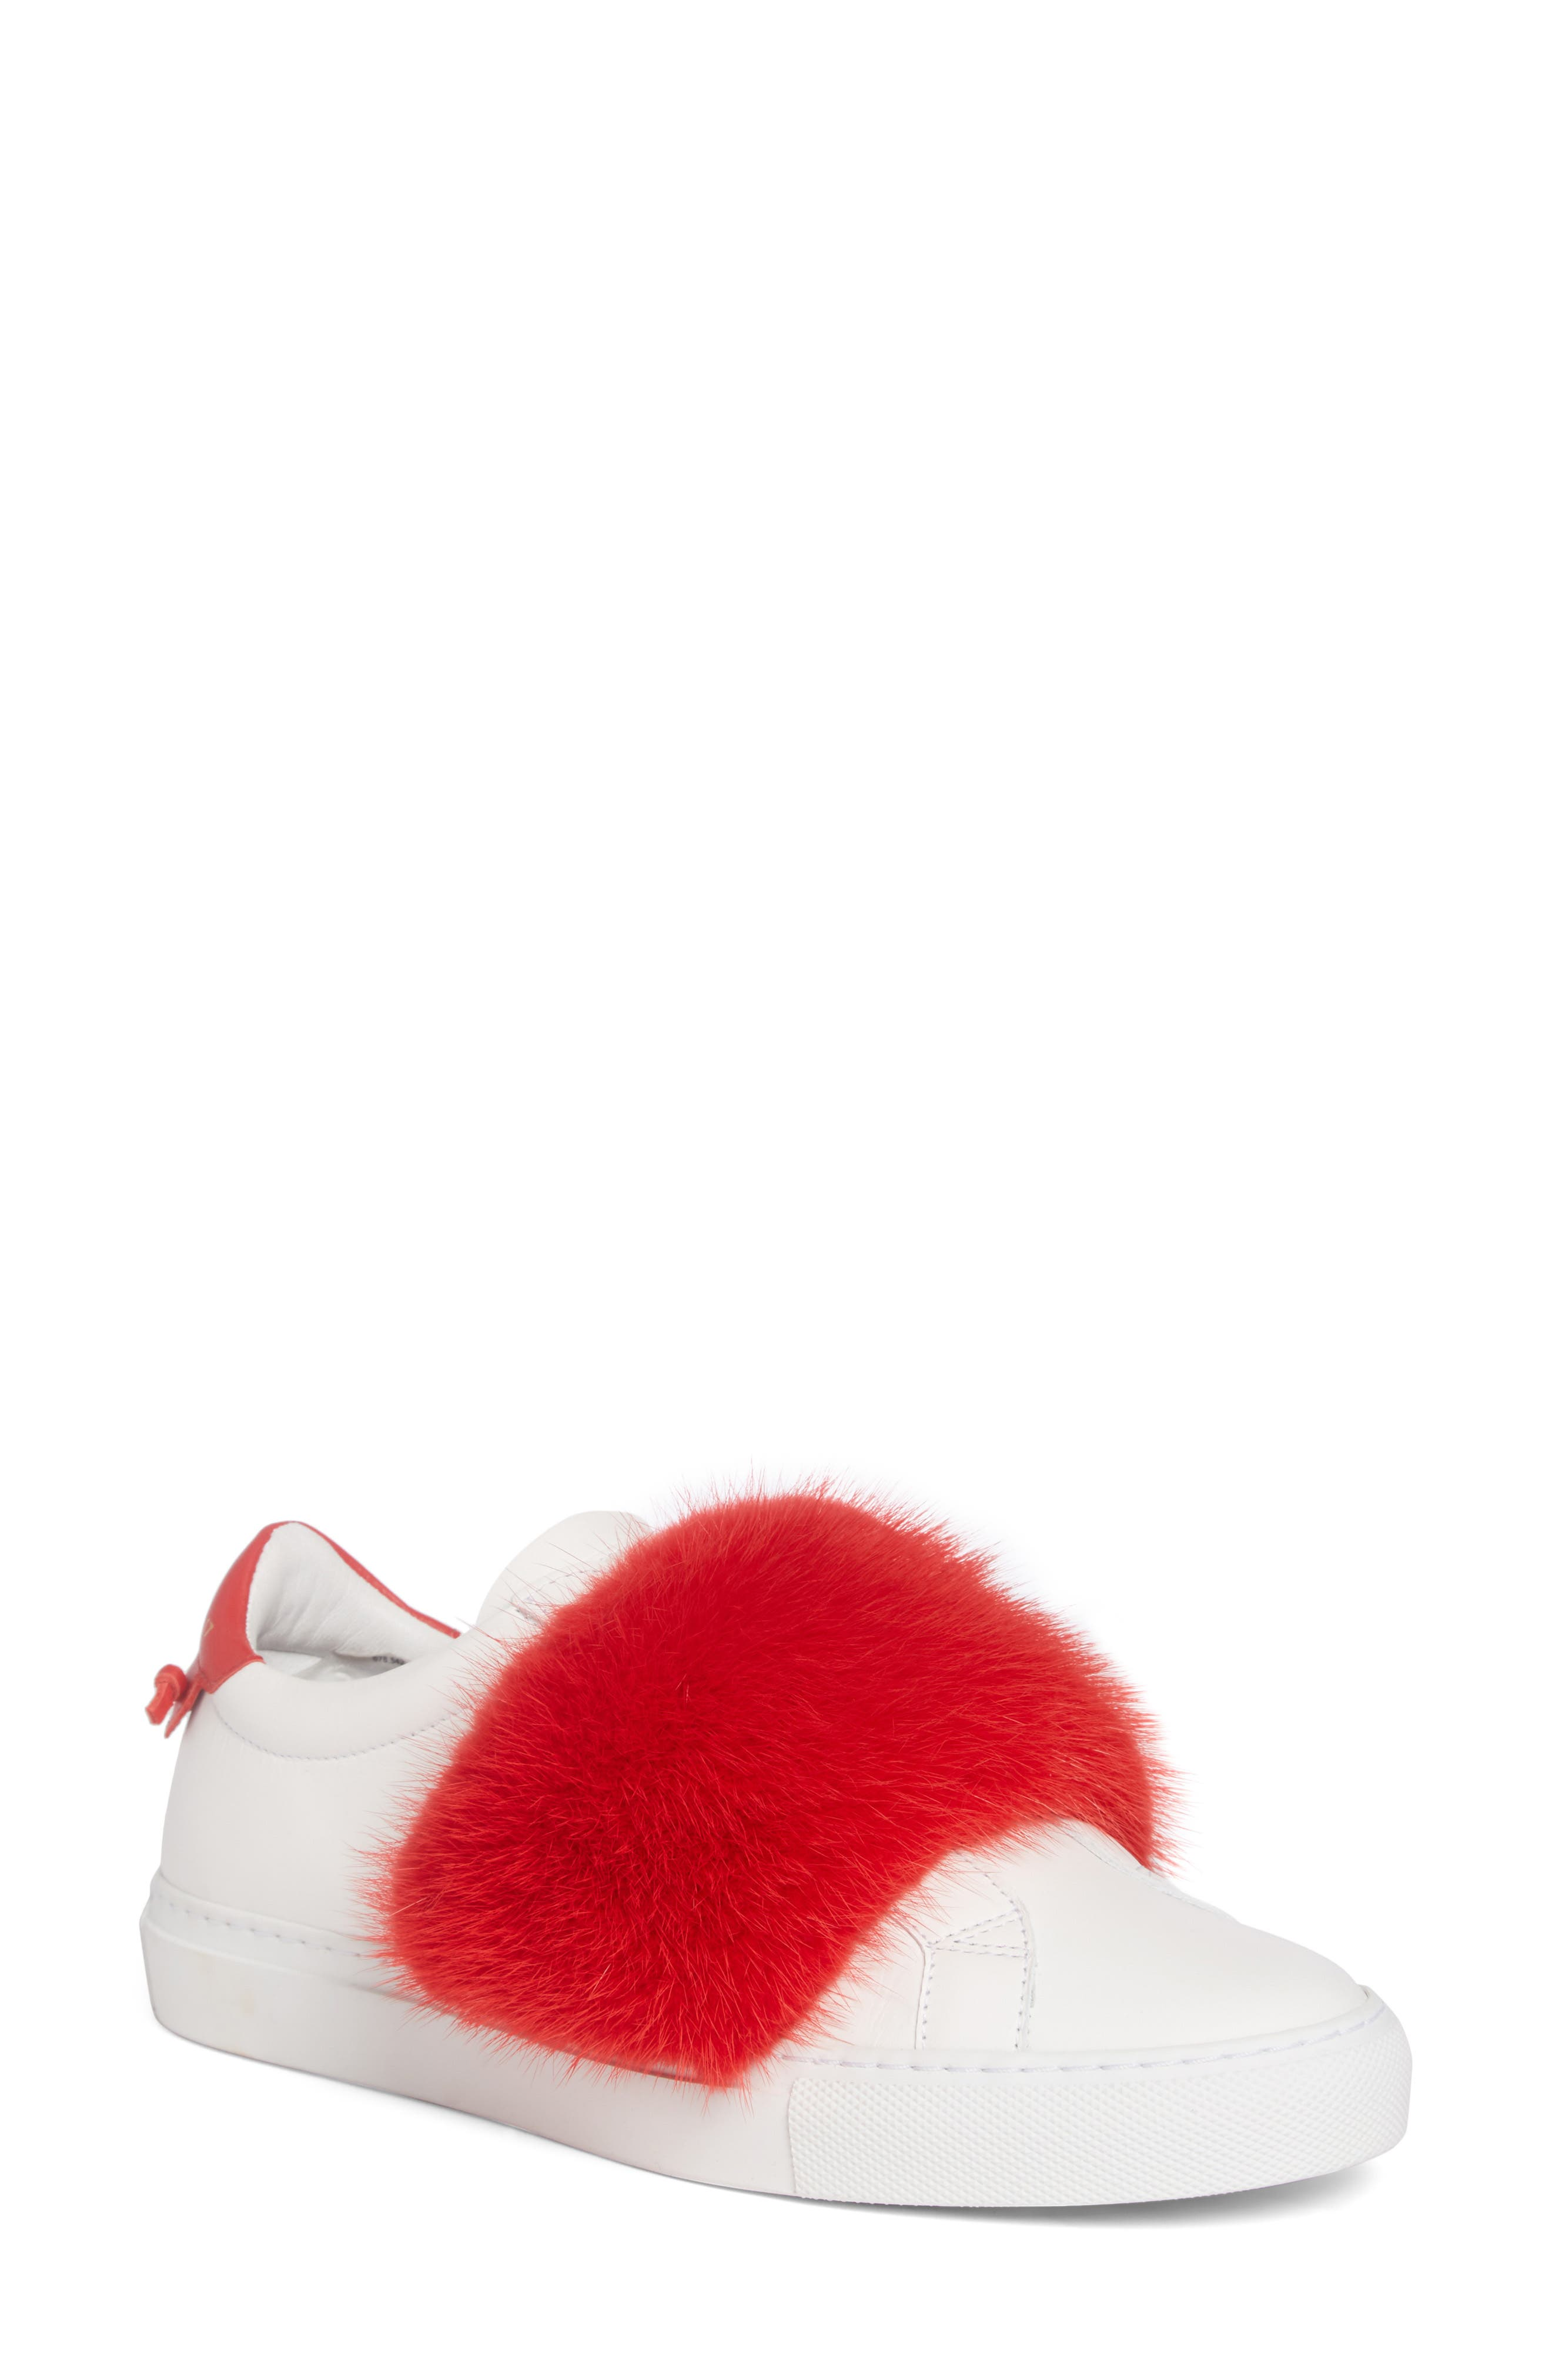 Urban Street Slip-On Sneaker with Genuine Mink Fur Trim,                             Main thumbnail 3, color,